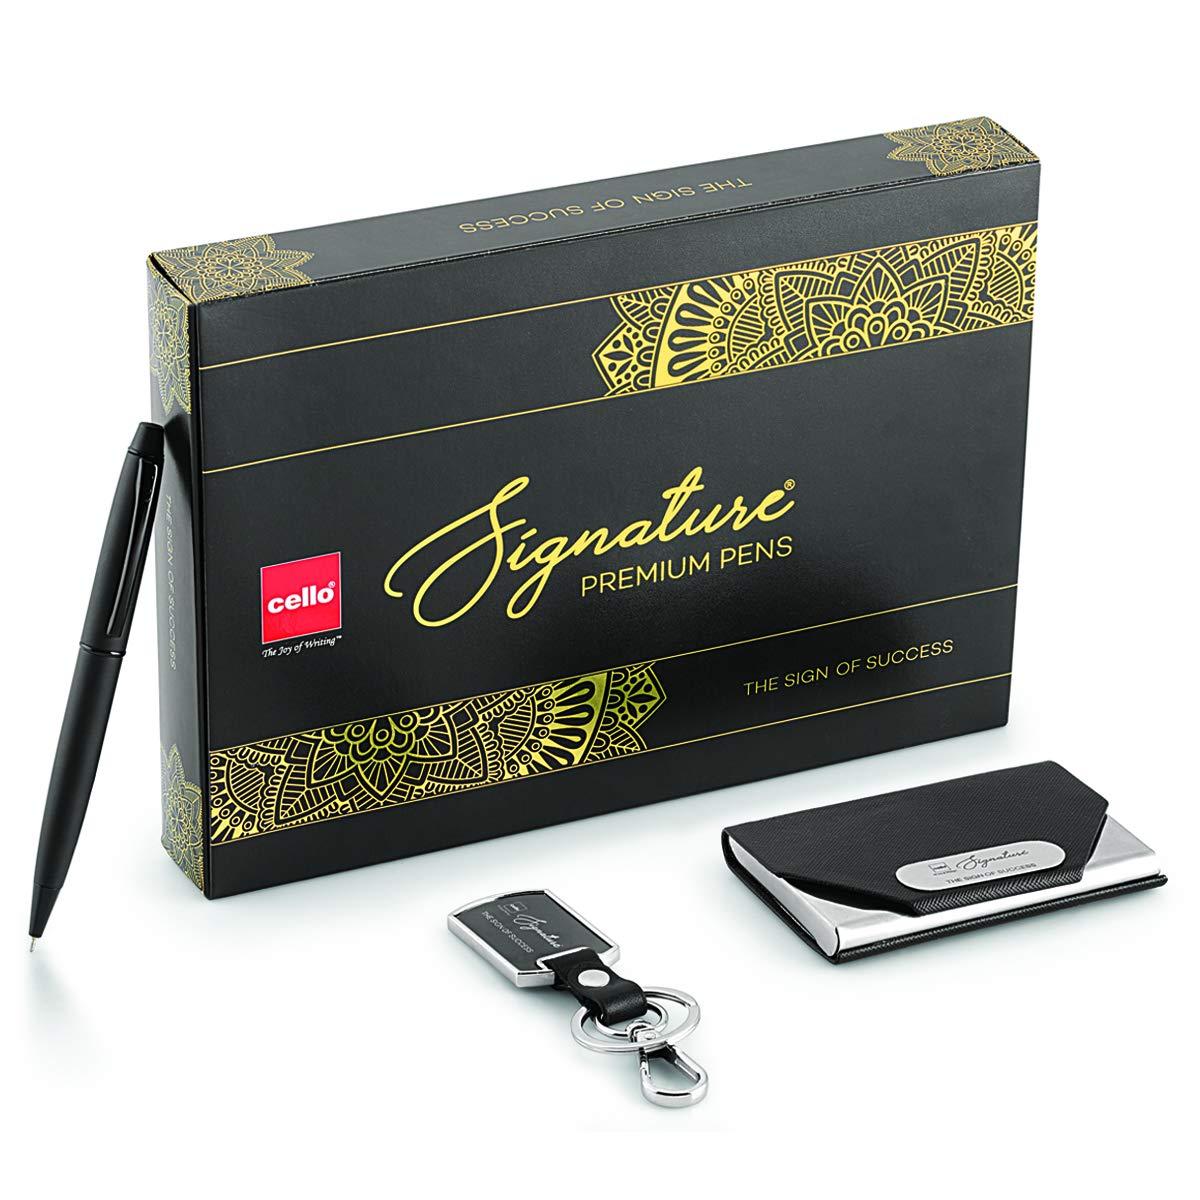 Cello Signature Carbon Executive Gift set product image